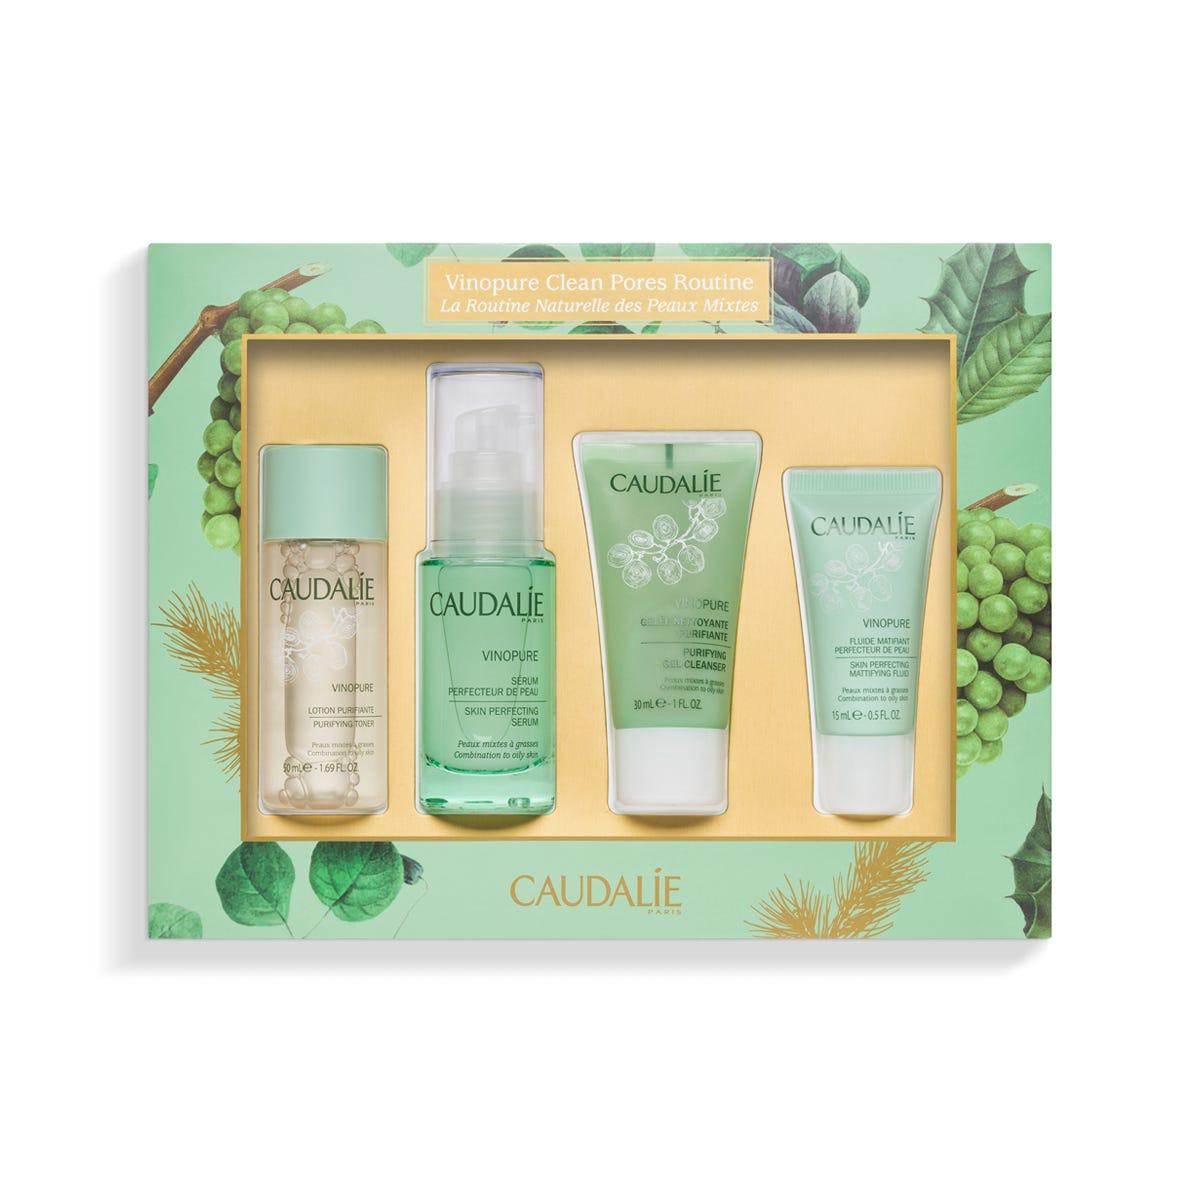 Vinopure Clean Pores Routine